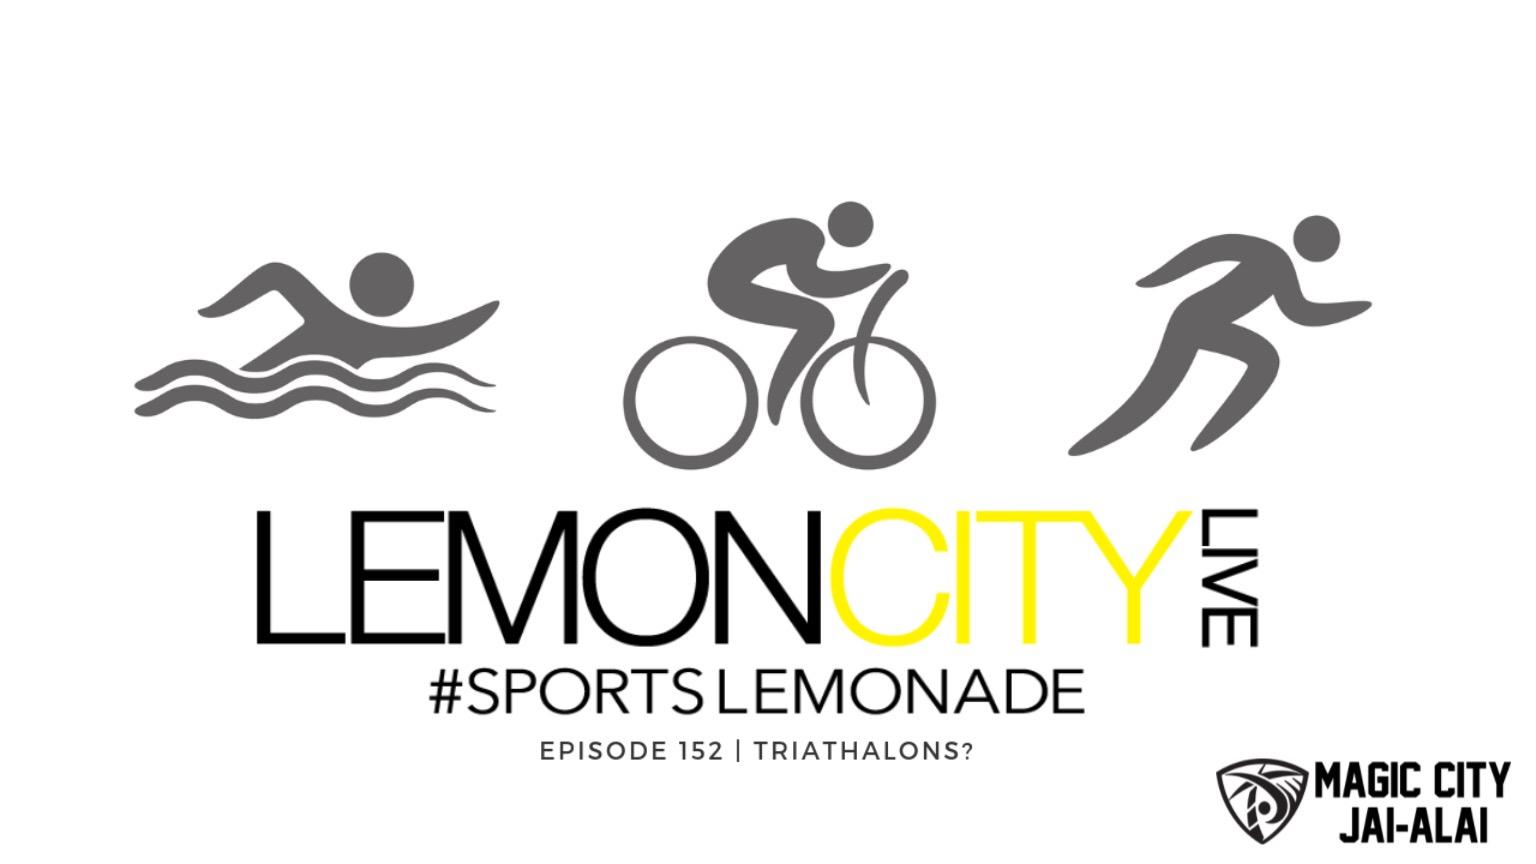 Lemon City Live